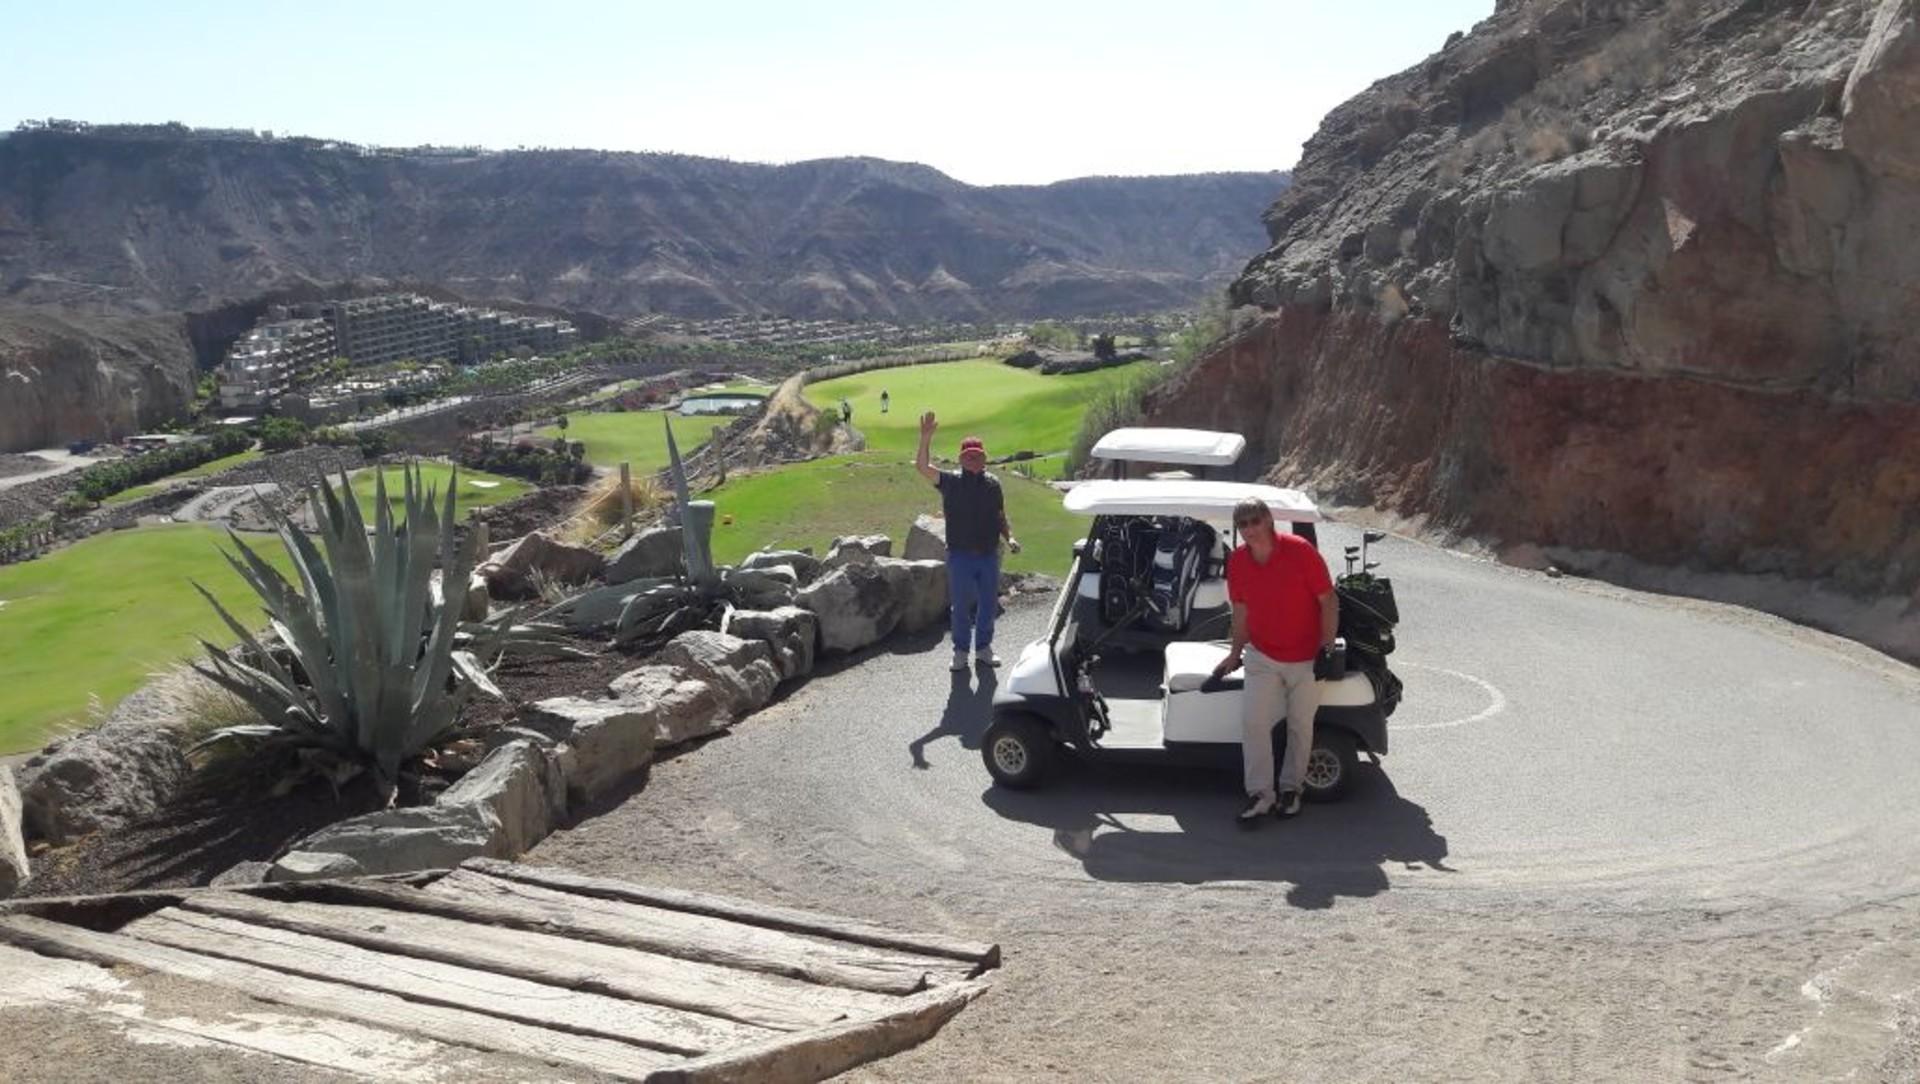 Golfreisebericht über die Kanaren, Gran Canaria - Sheraton Salobre Hotel (jetzt Salobre Hotel Resort & Serenity)